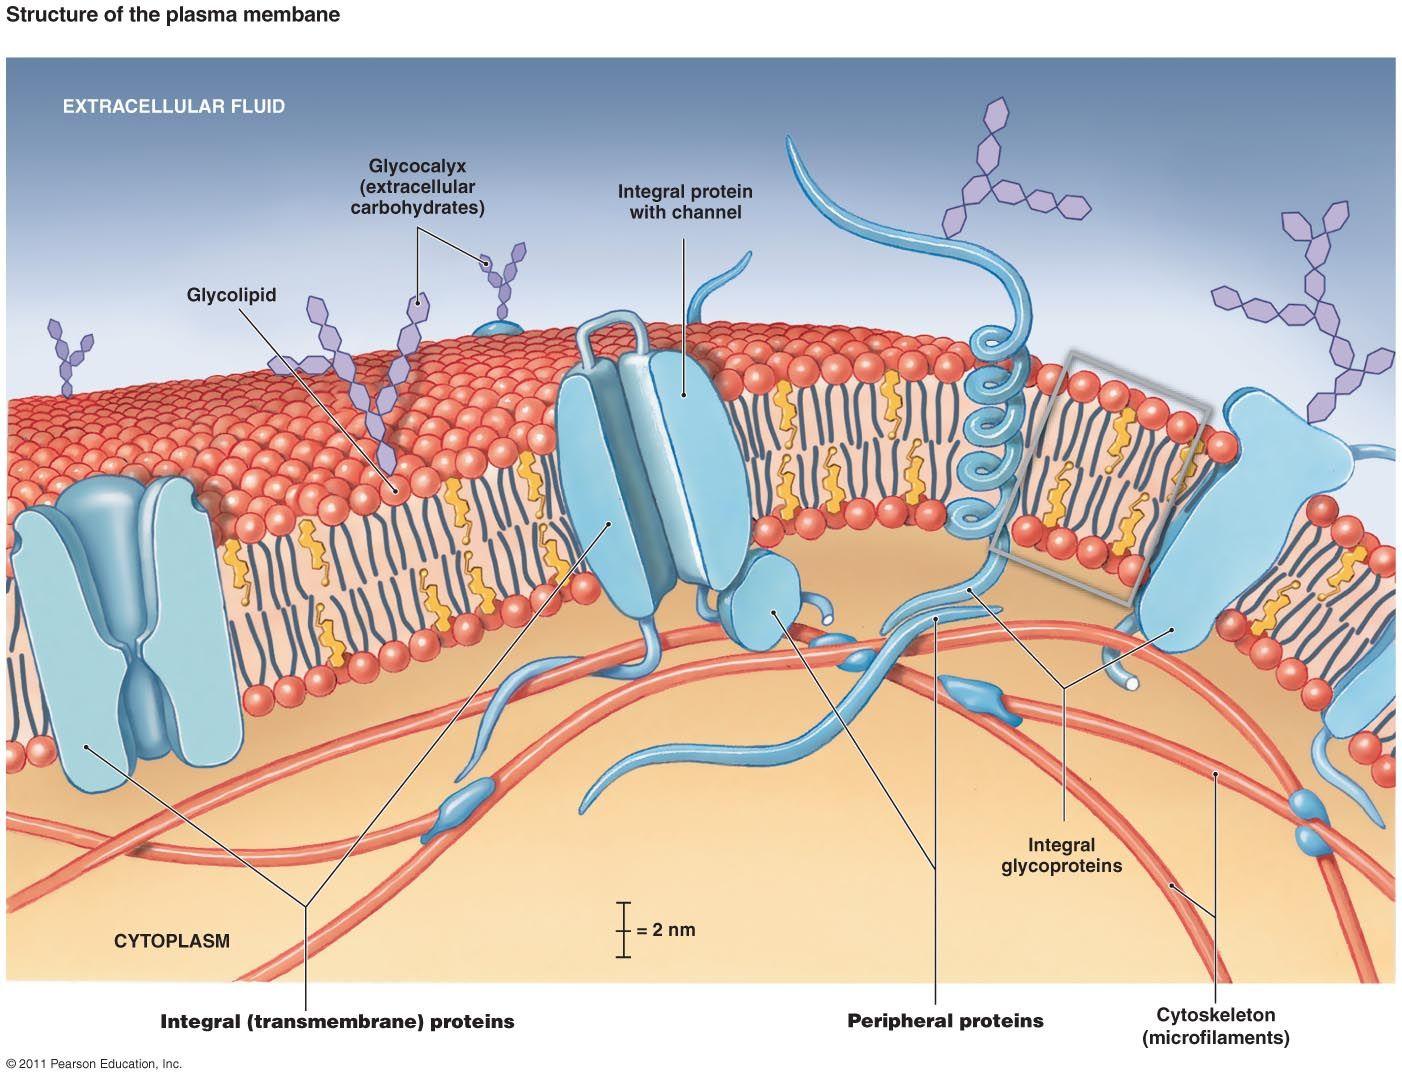 cell membrane structure diagram cell membrane diagram [ 1402 x 1080 Pixel ]